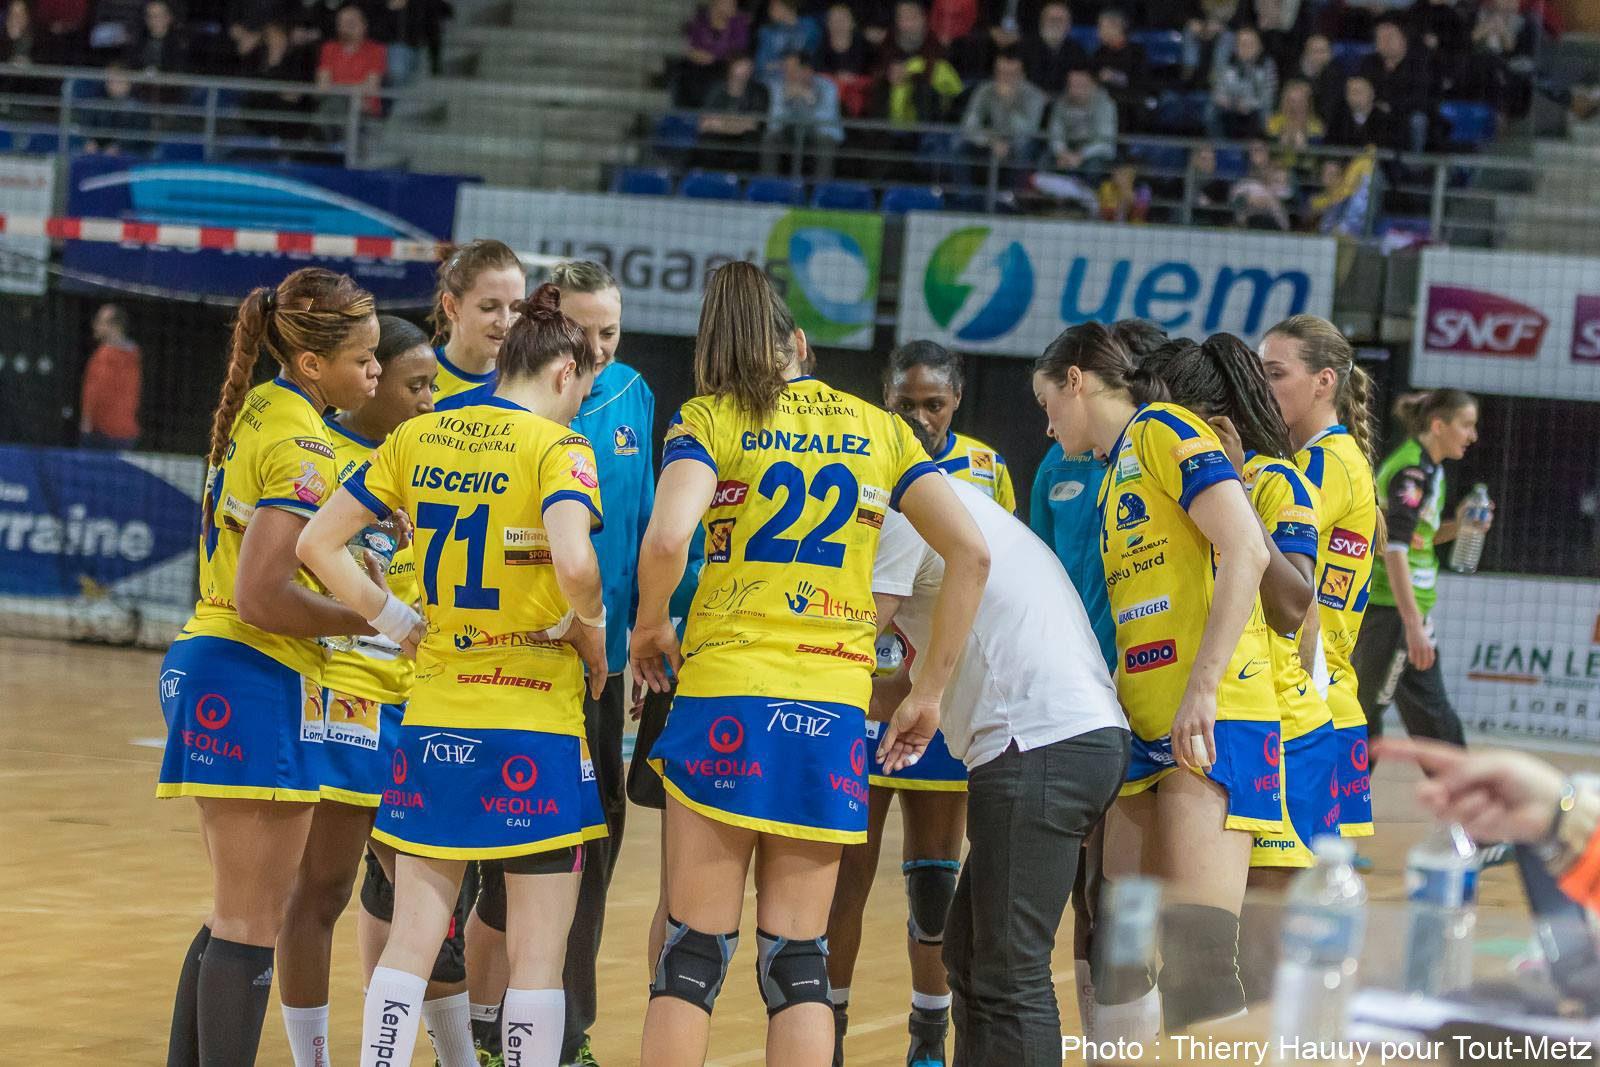 Ligue des Champions : Metz Handball reçoit Györ aux Arènes